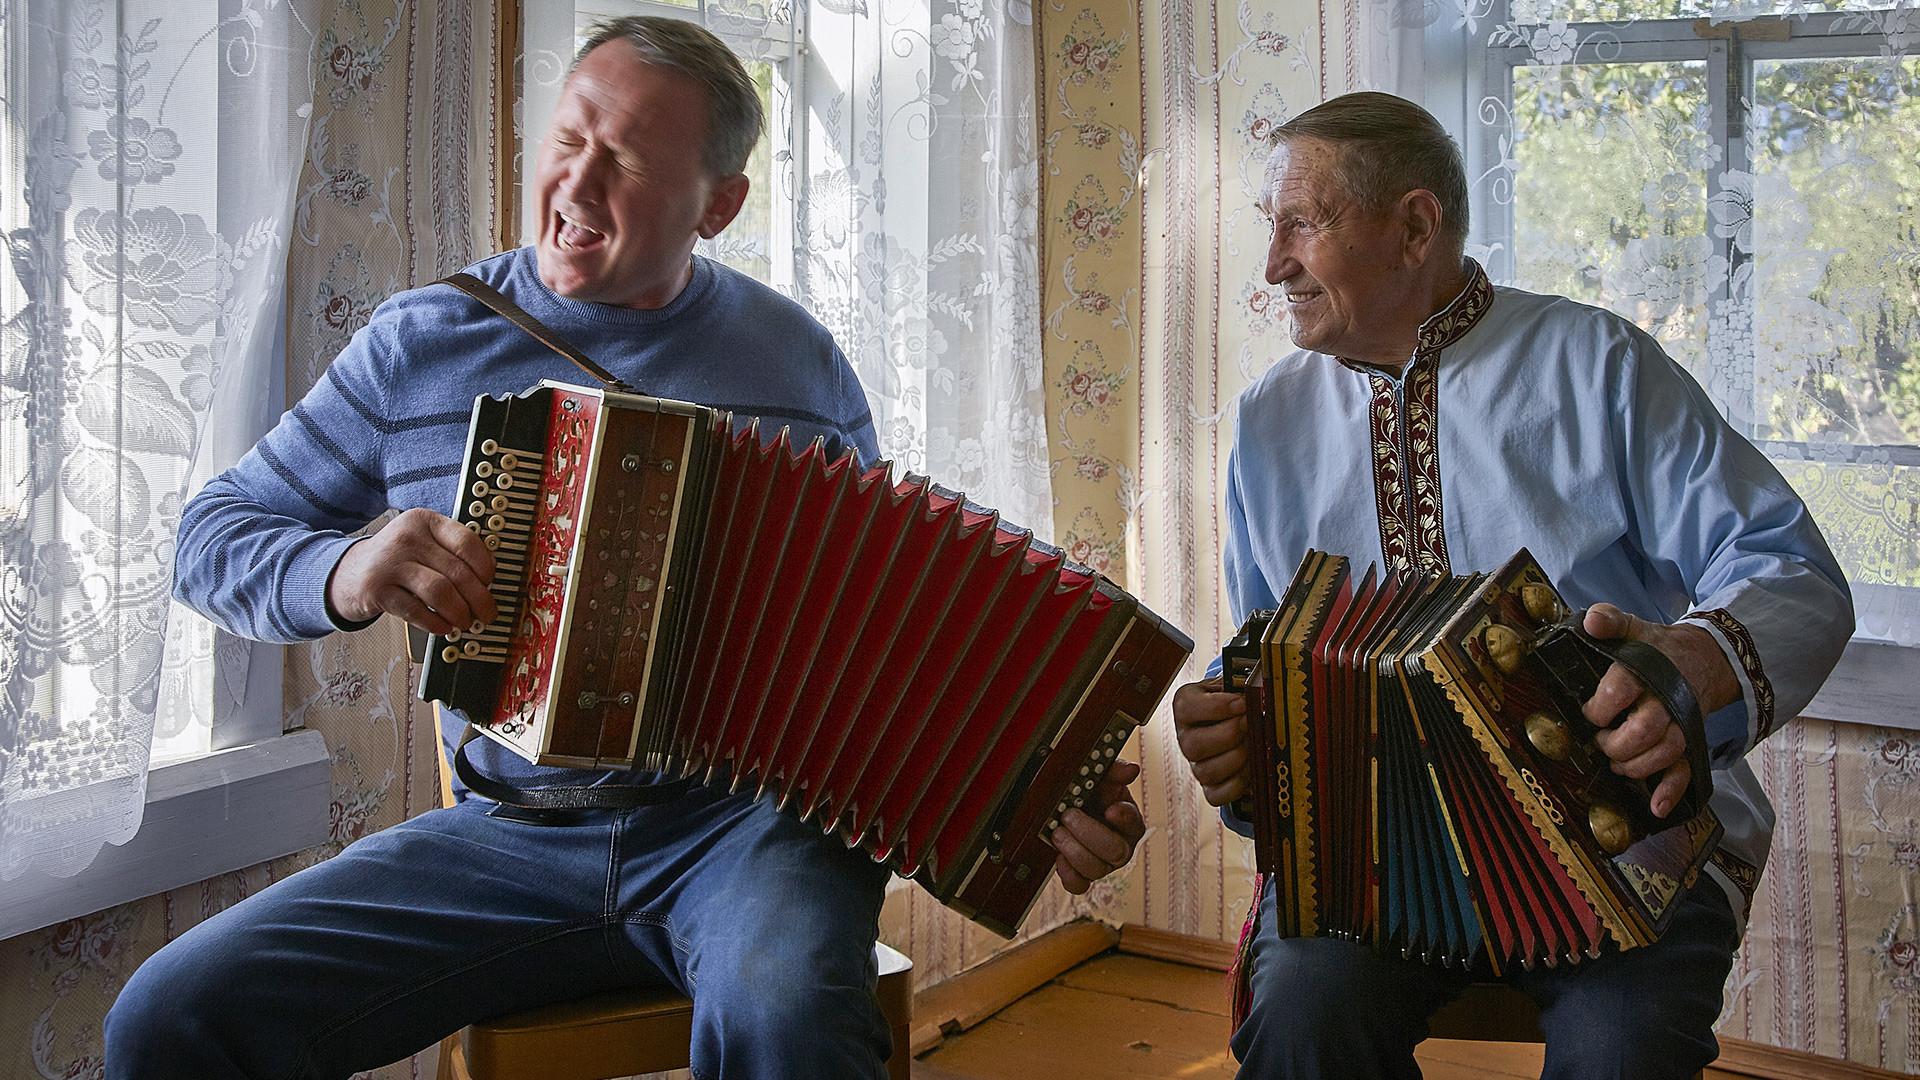 Ivan Pechkov, chef de kolkhoz (ferme collective), avec le plus vieil accordéoniste du district, Veniamin Kourbatov. Région de Vologda, village de Tarnogorski gorodok.